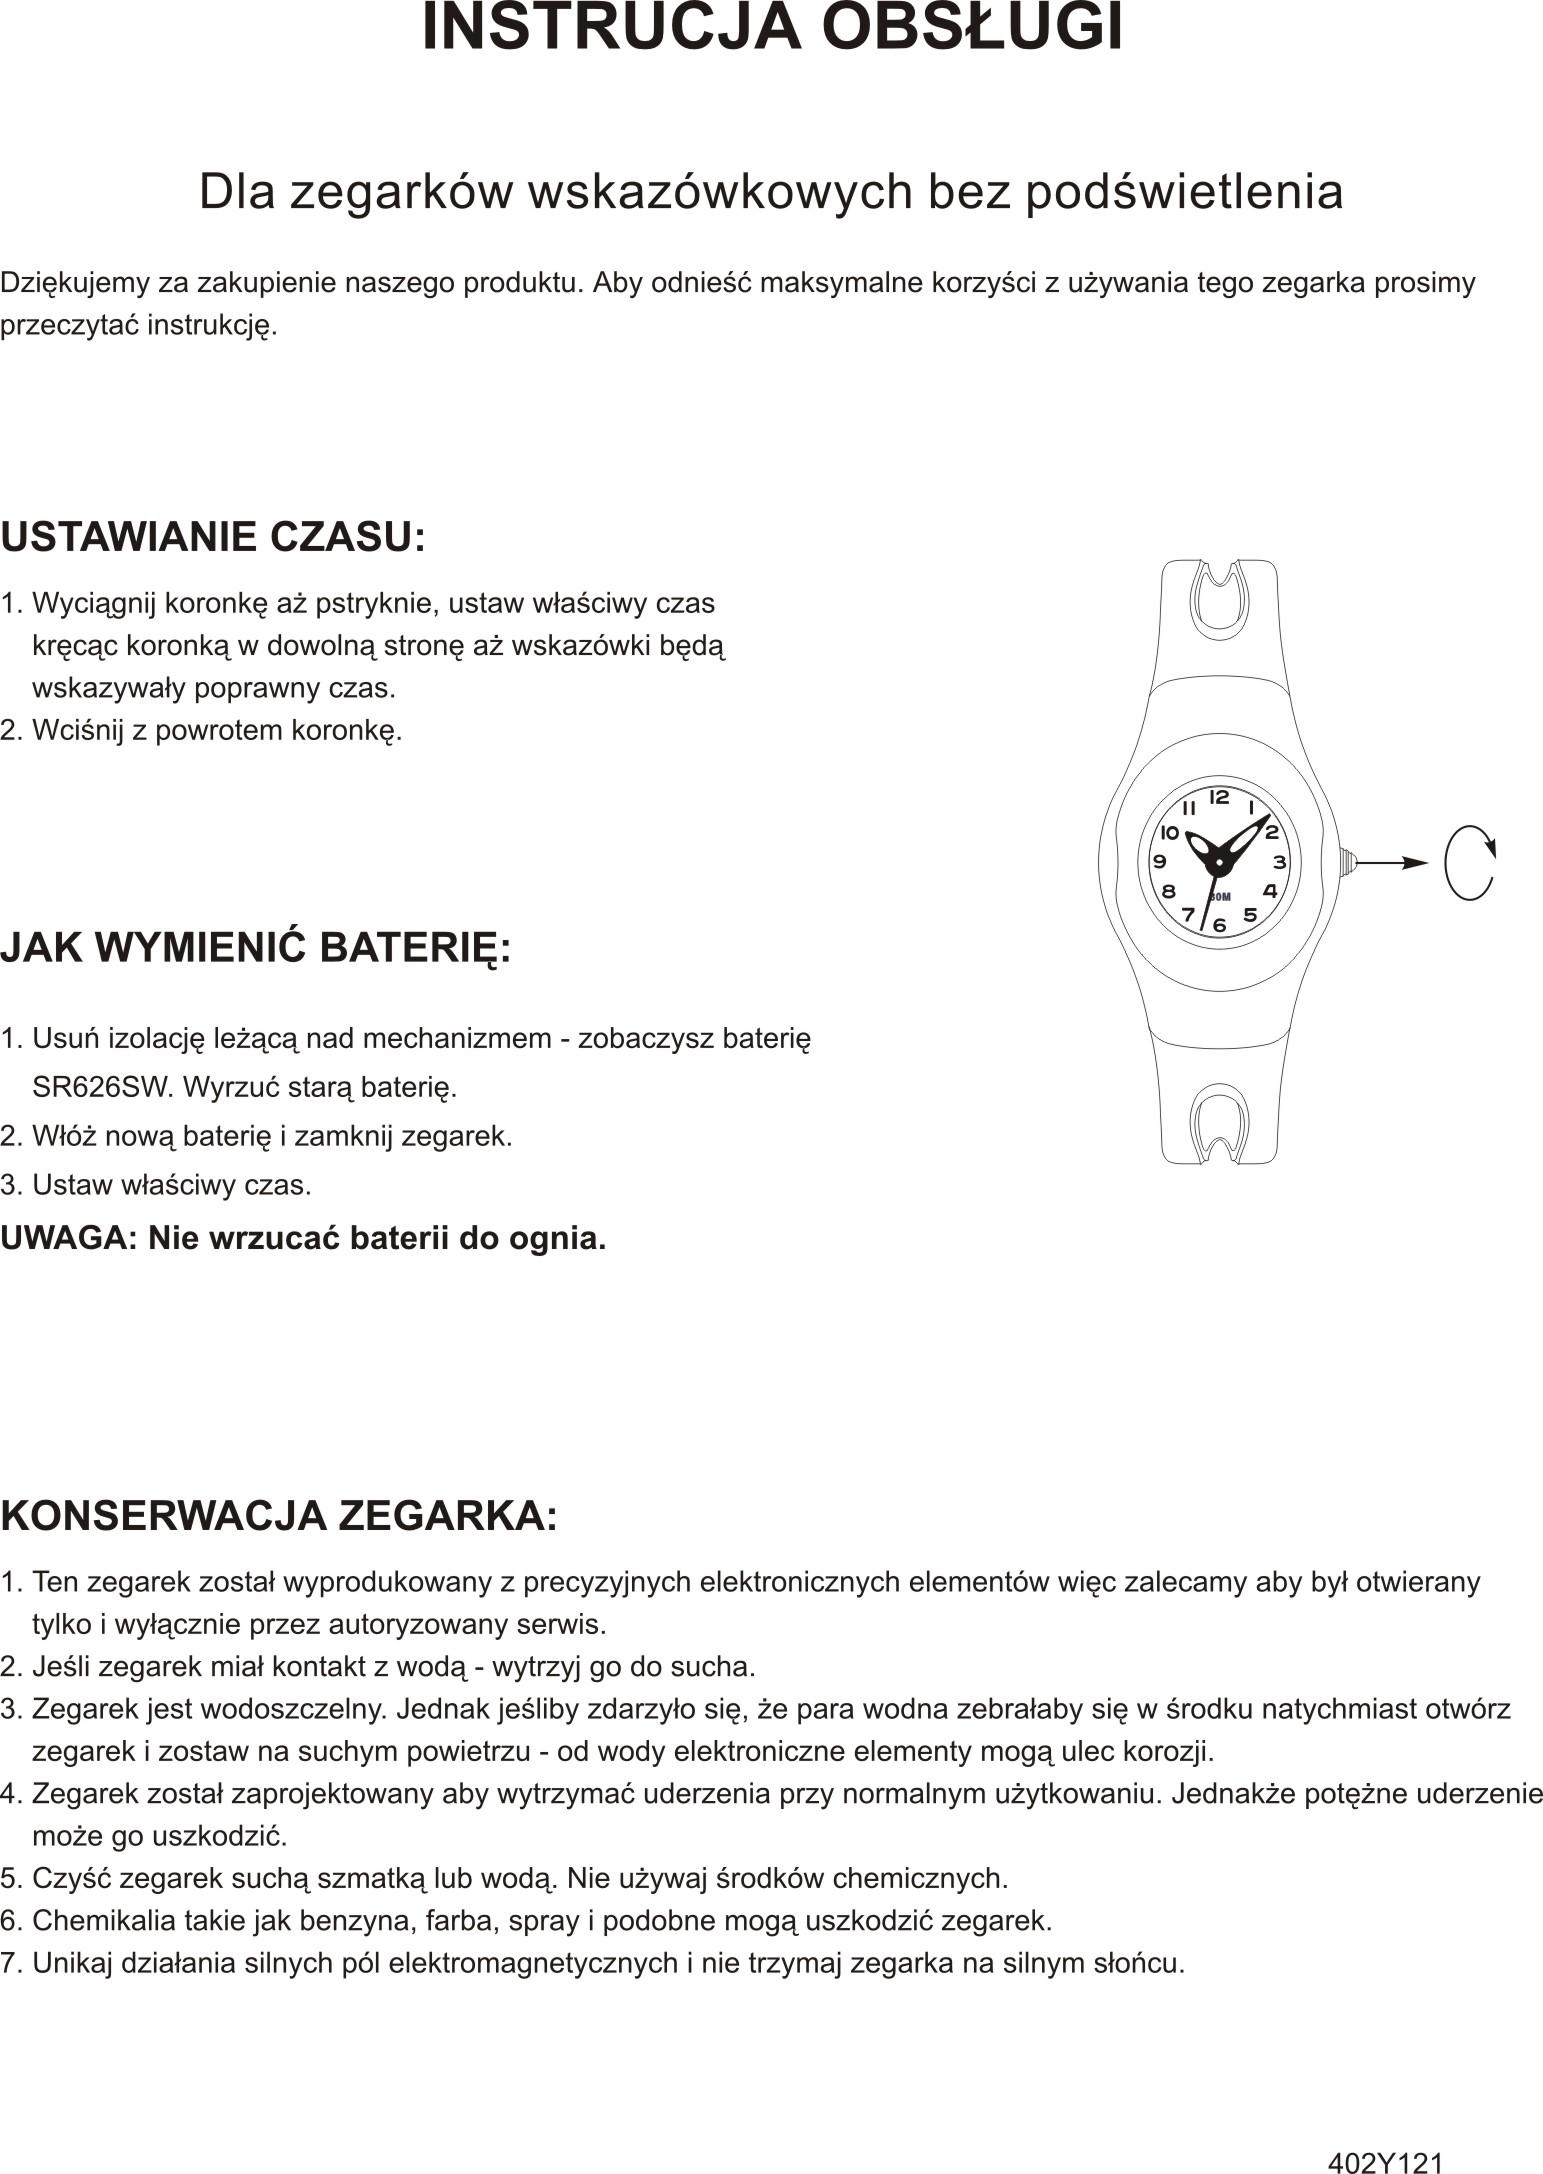 Manual xonix hrm1